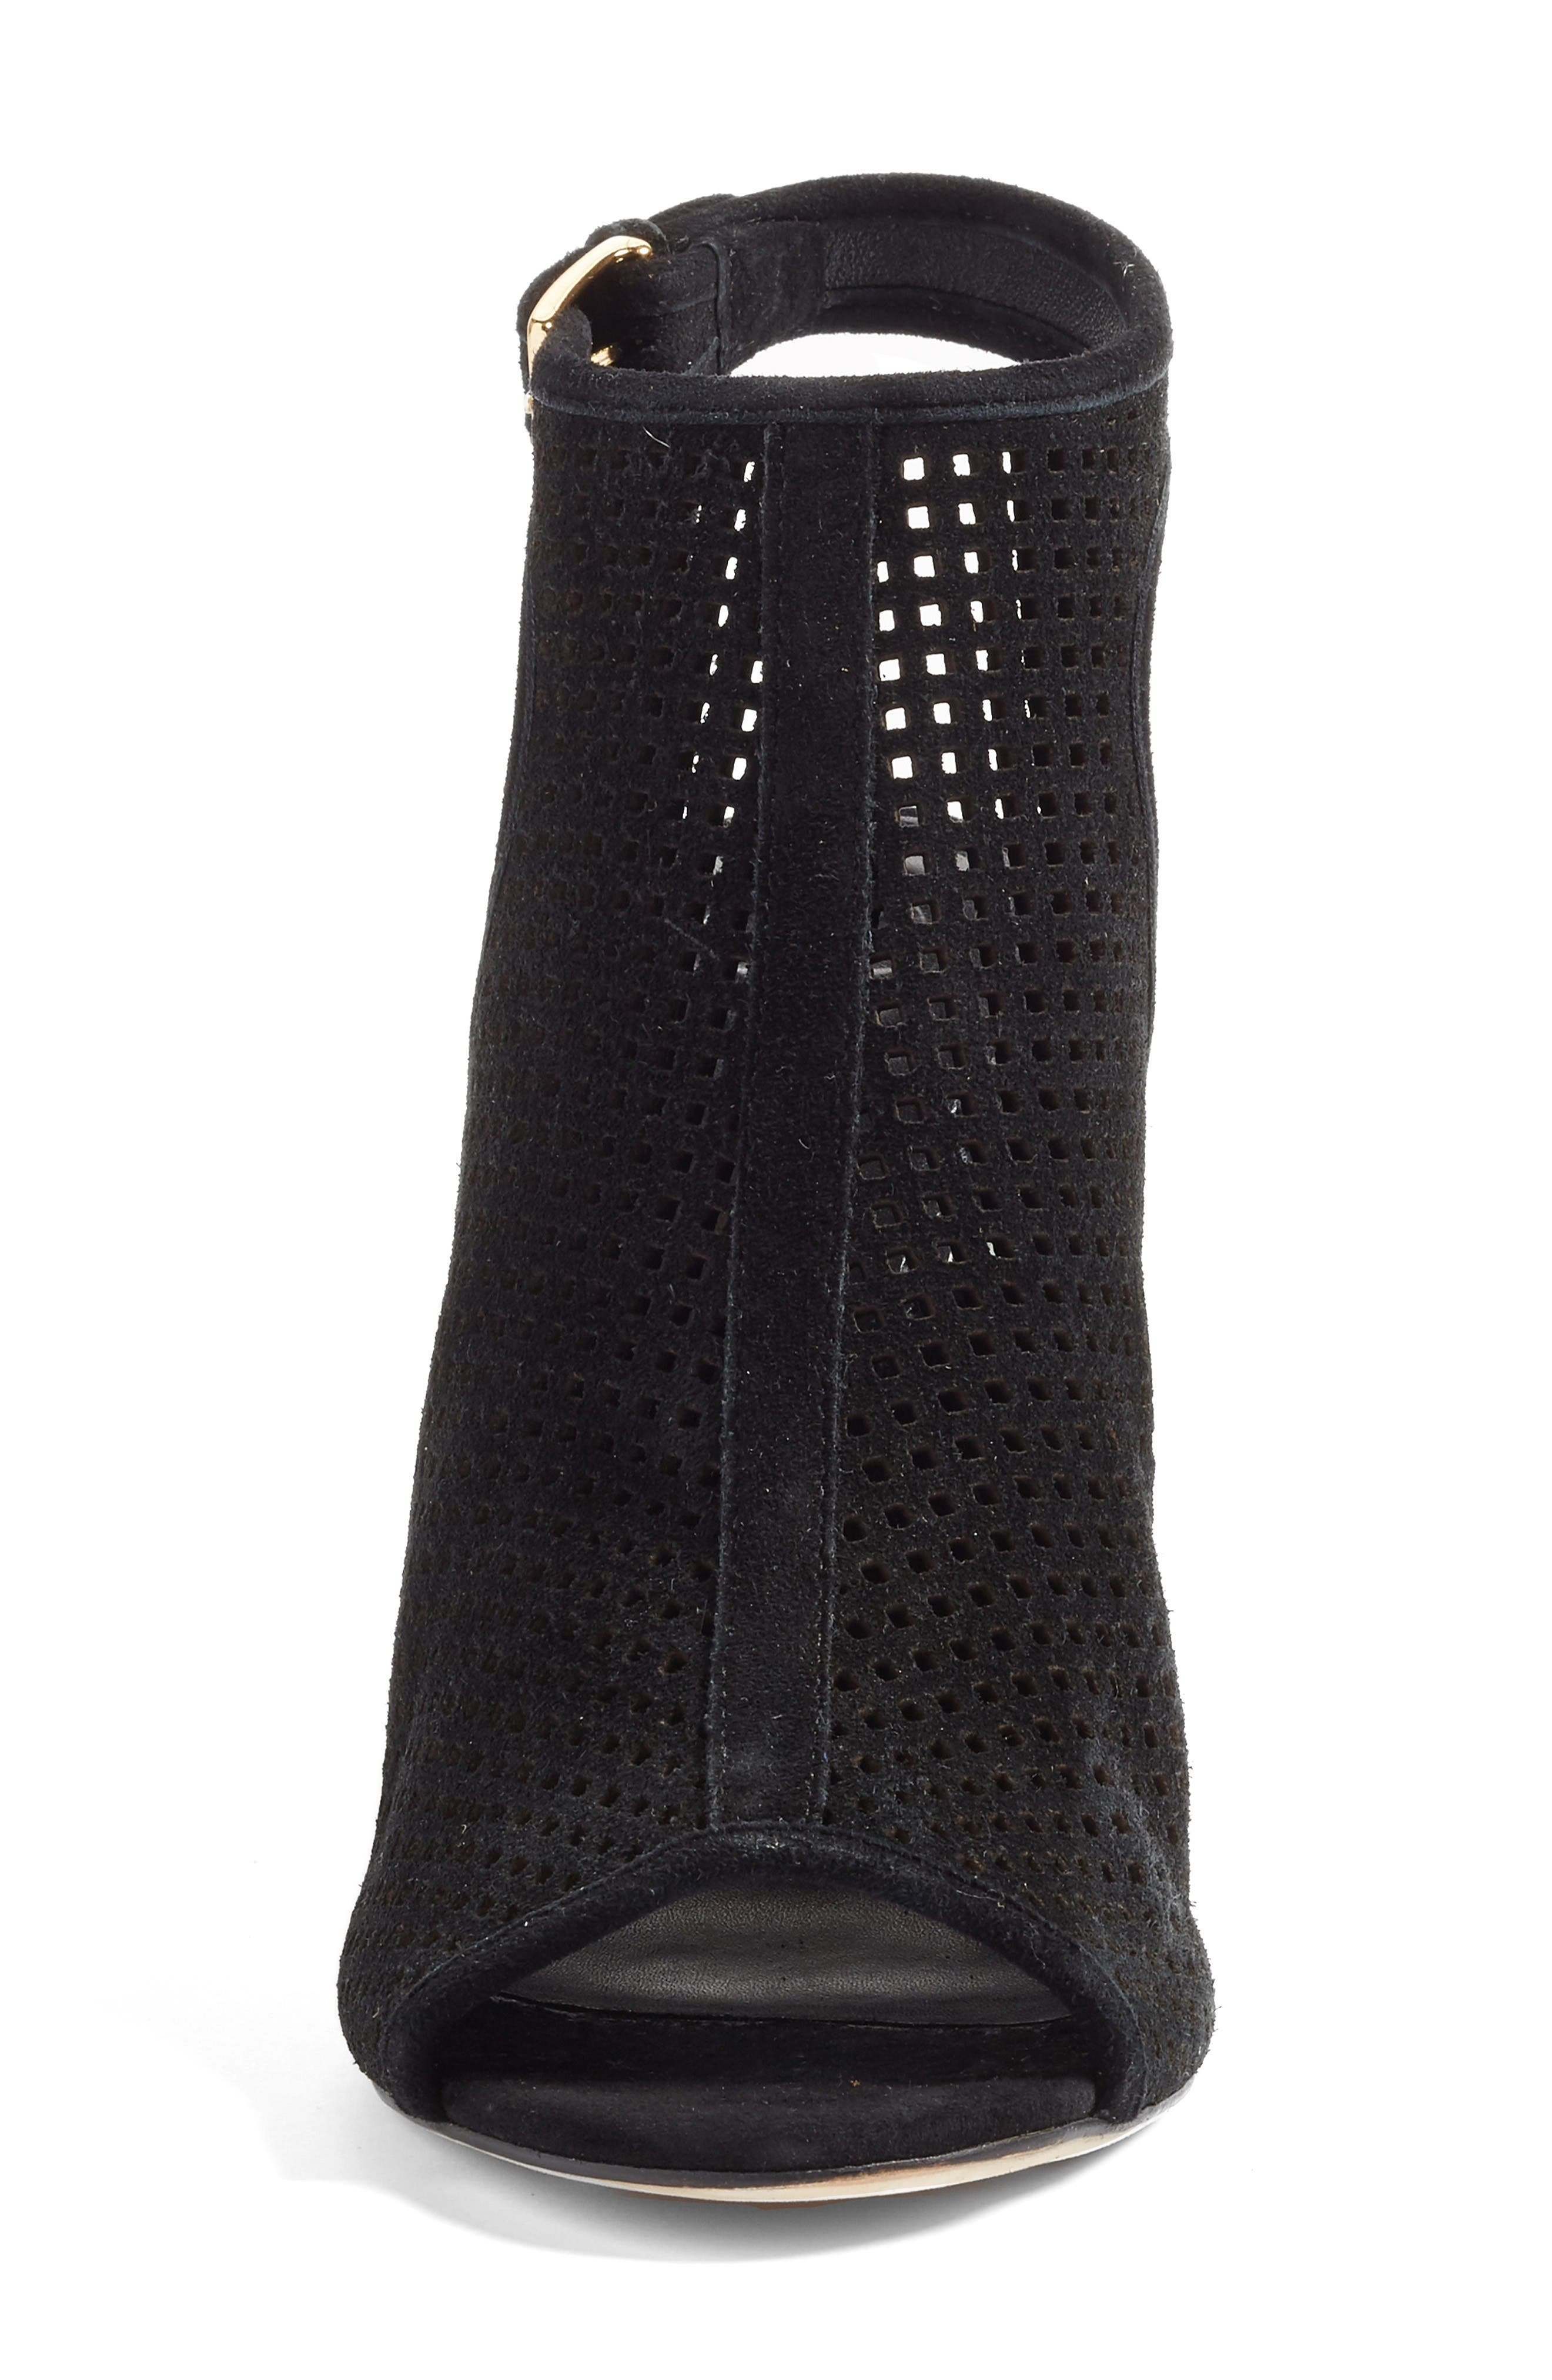 Alternate Image 3  - Tory Burch Jesse Block Heel Bootie (Women)